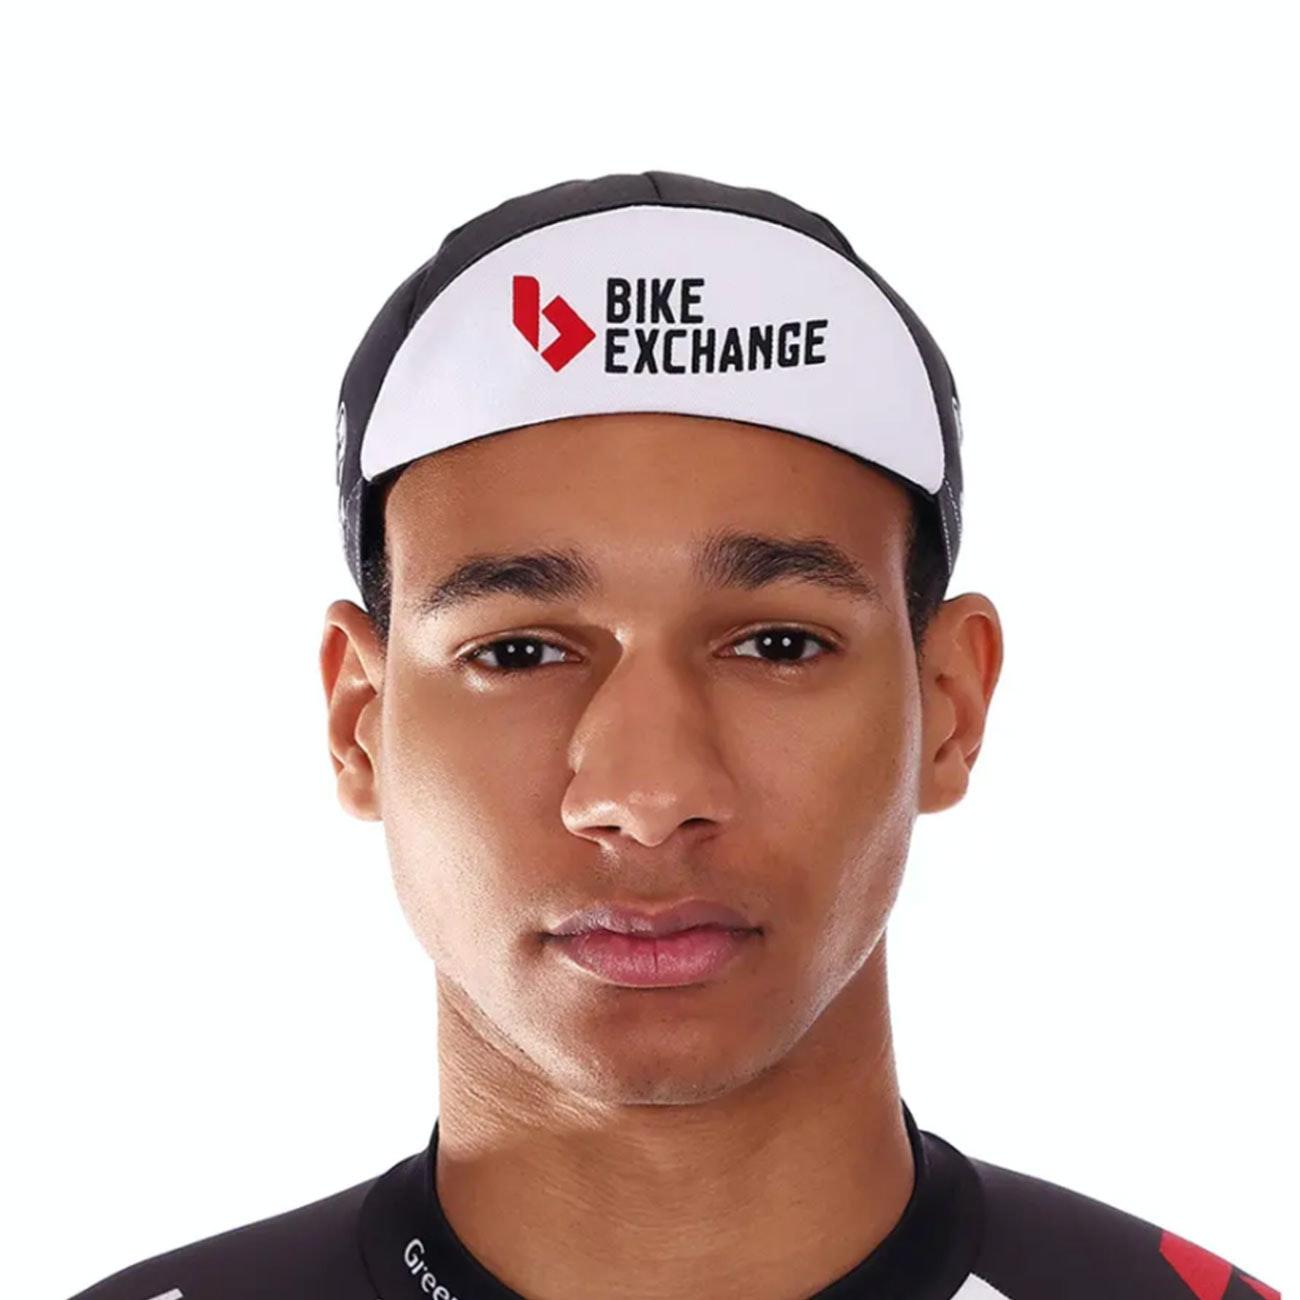 Giordana Cotton Cycling Cap pro Team